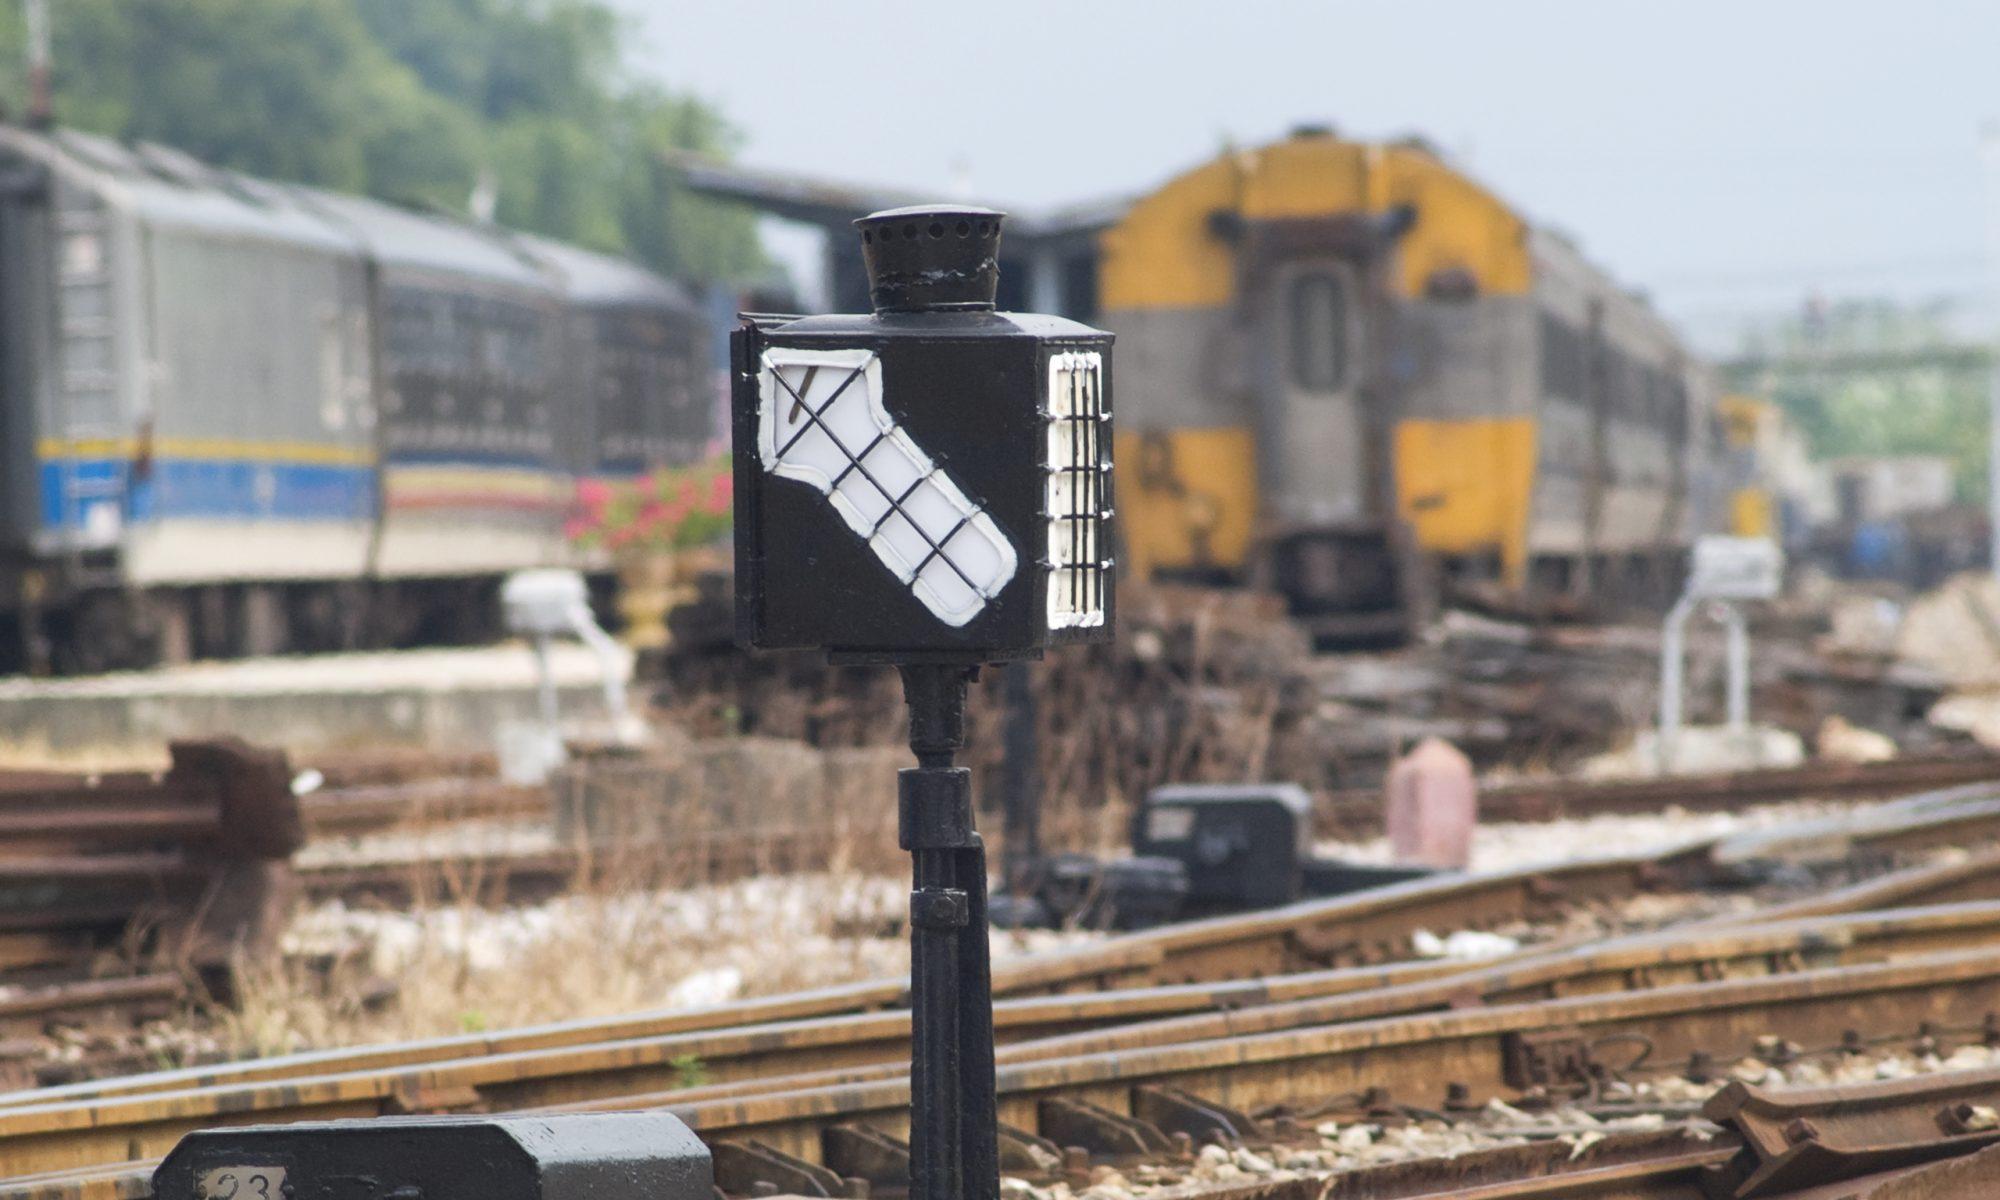 Espace Train Miniature